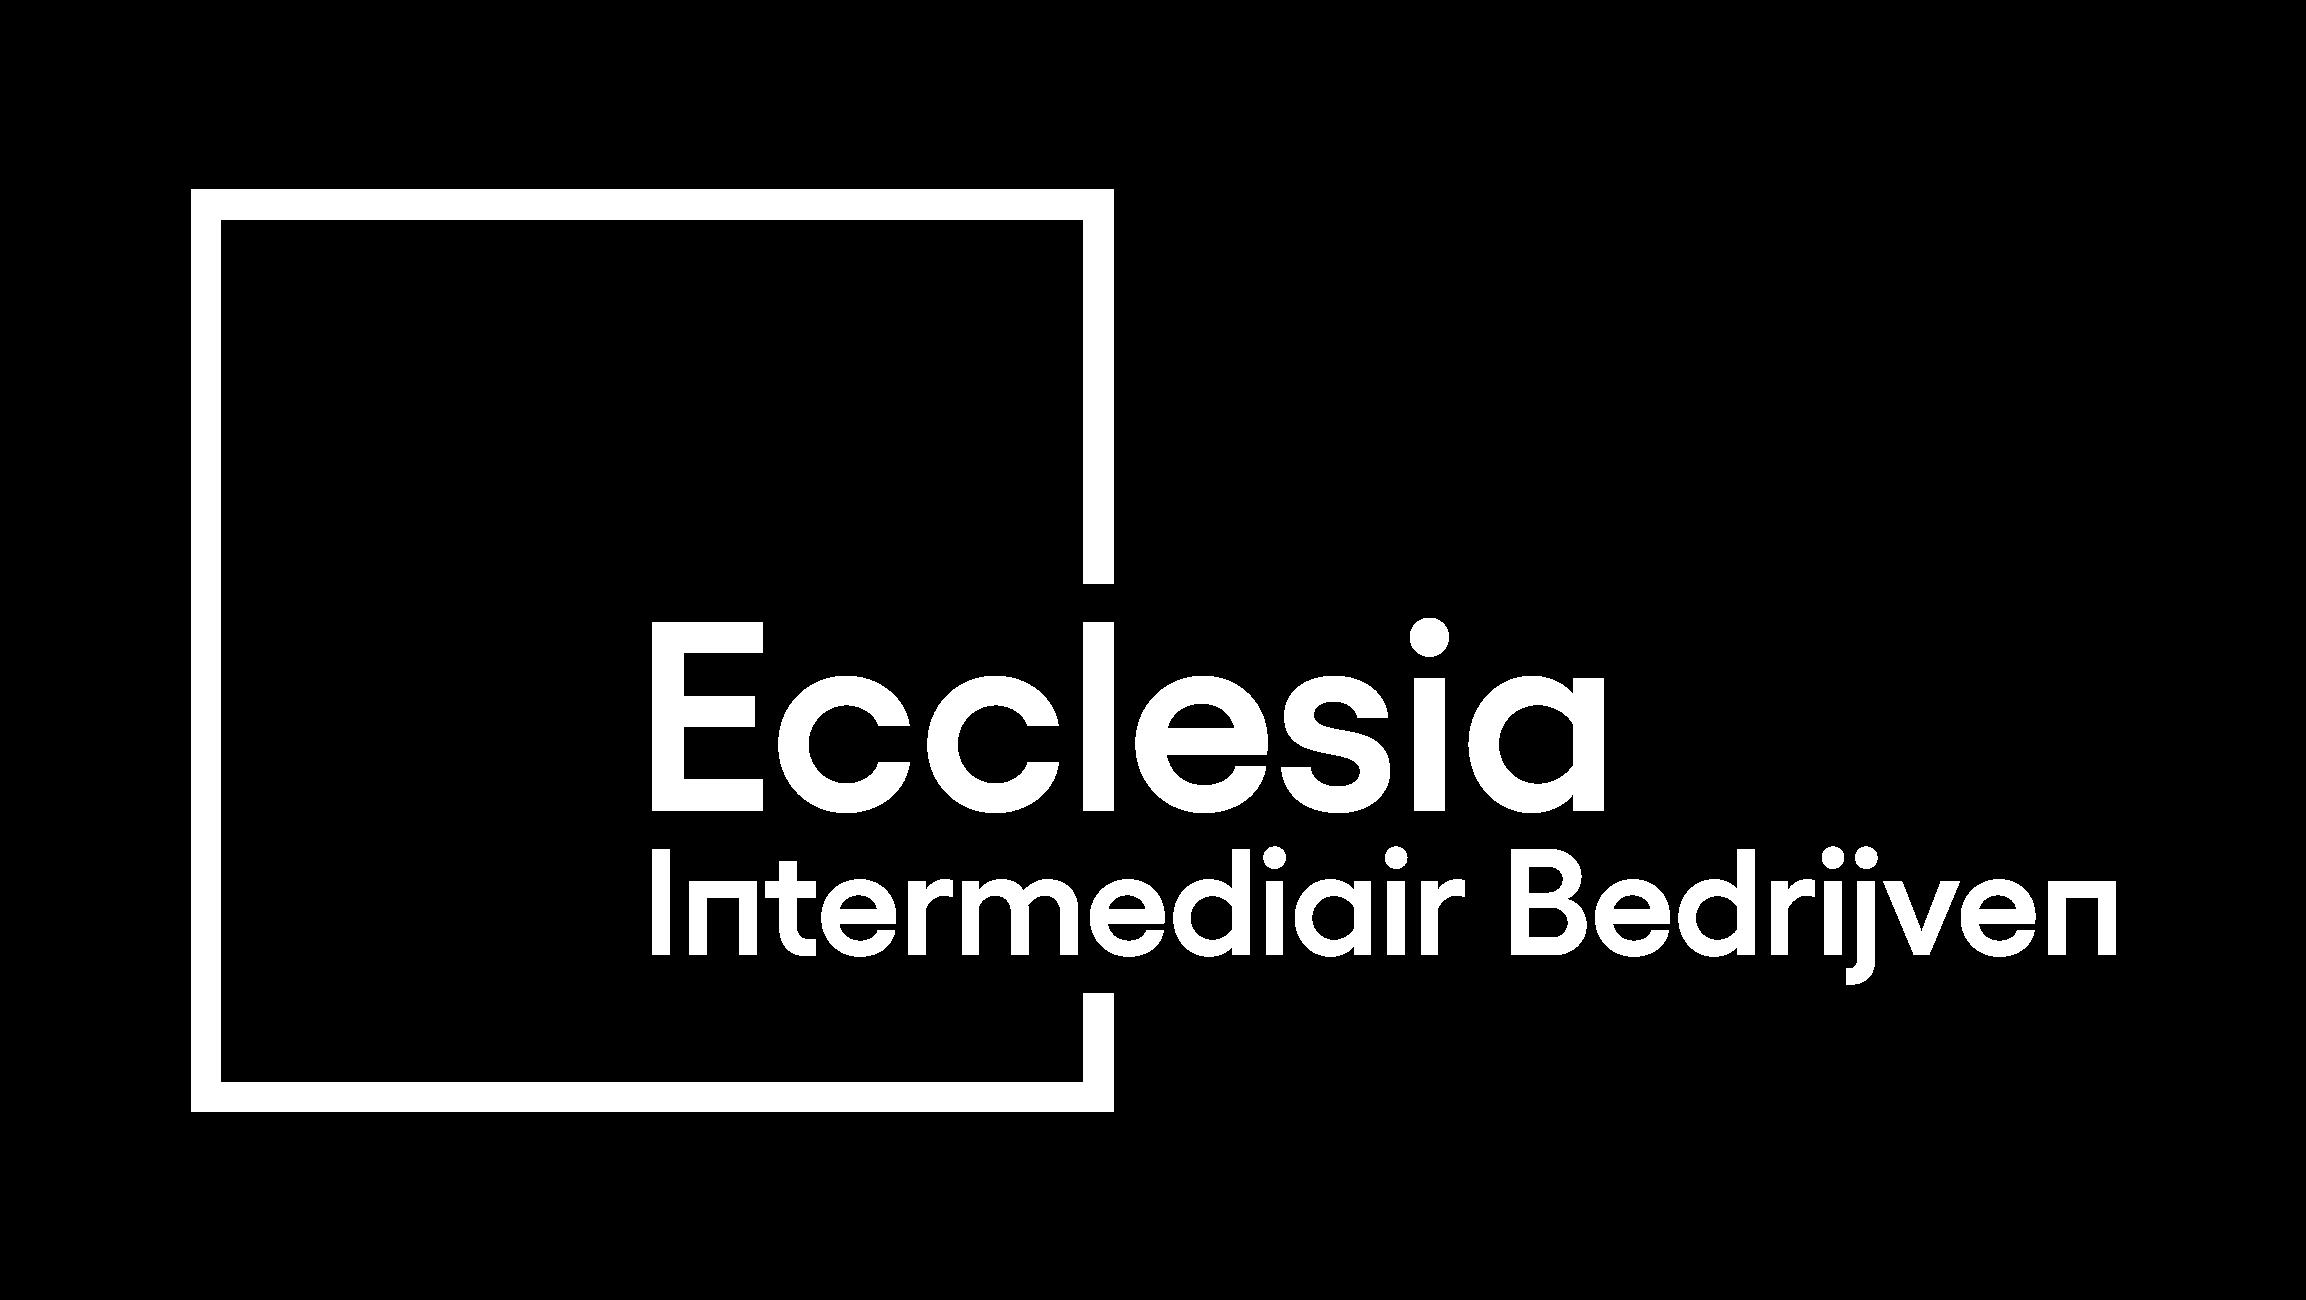 Ecclesia Intermediair